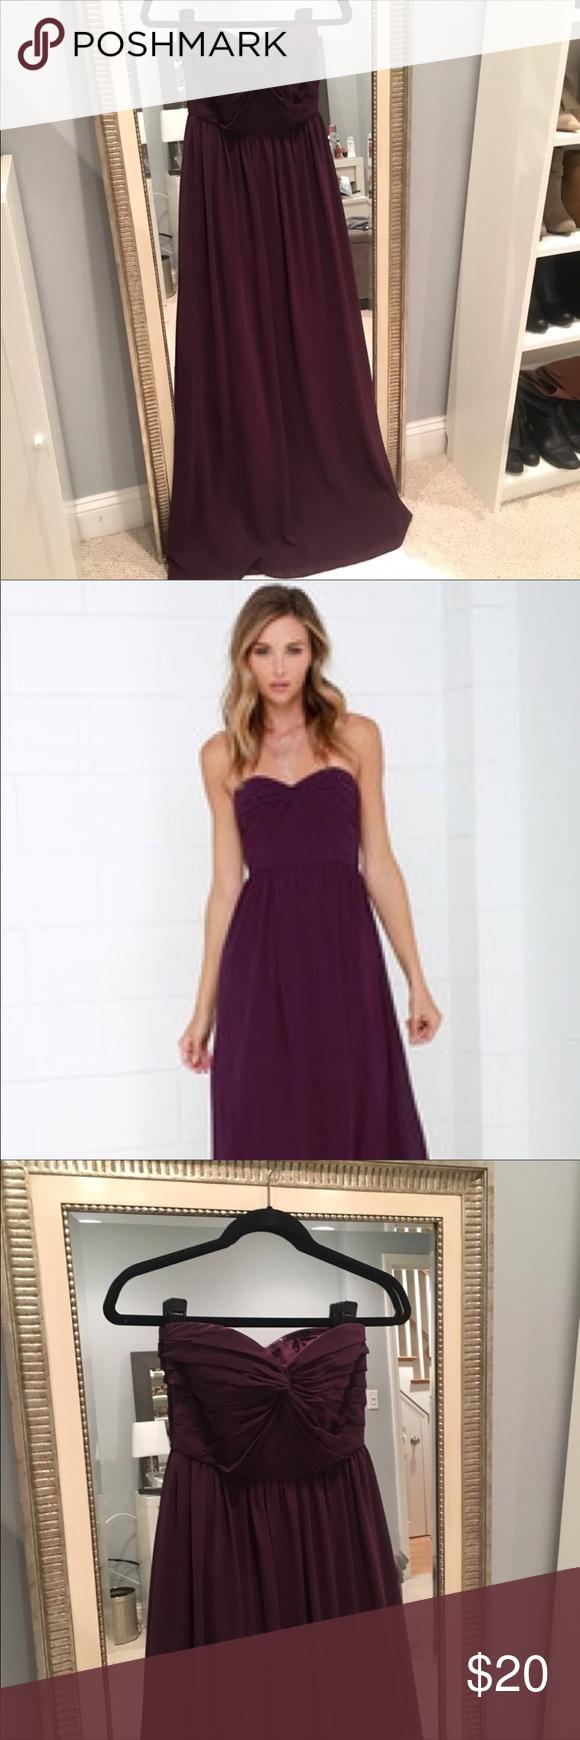 Lulus wedding guest dress  Lulus maxi formal burgundy maroon dark prom dress  Strapless dress